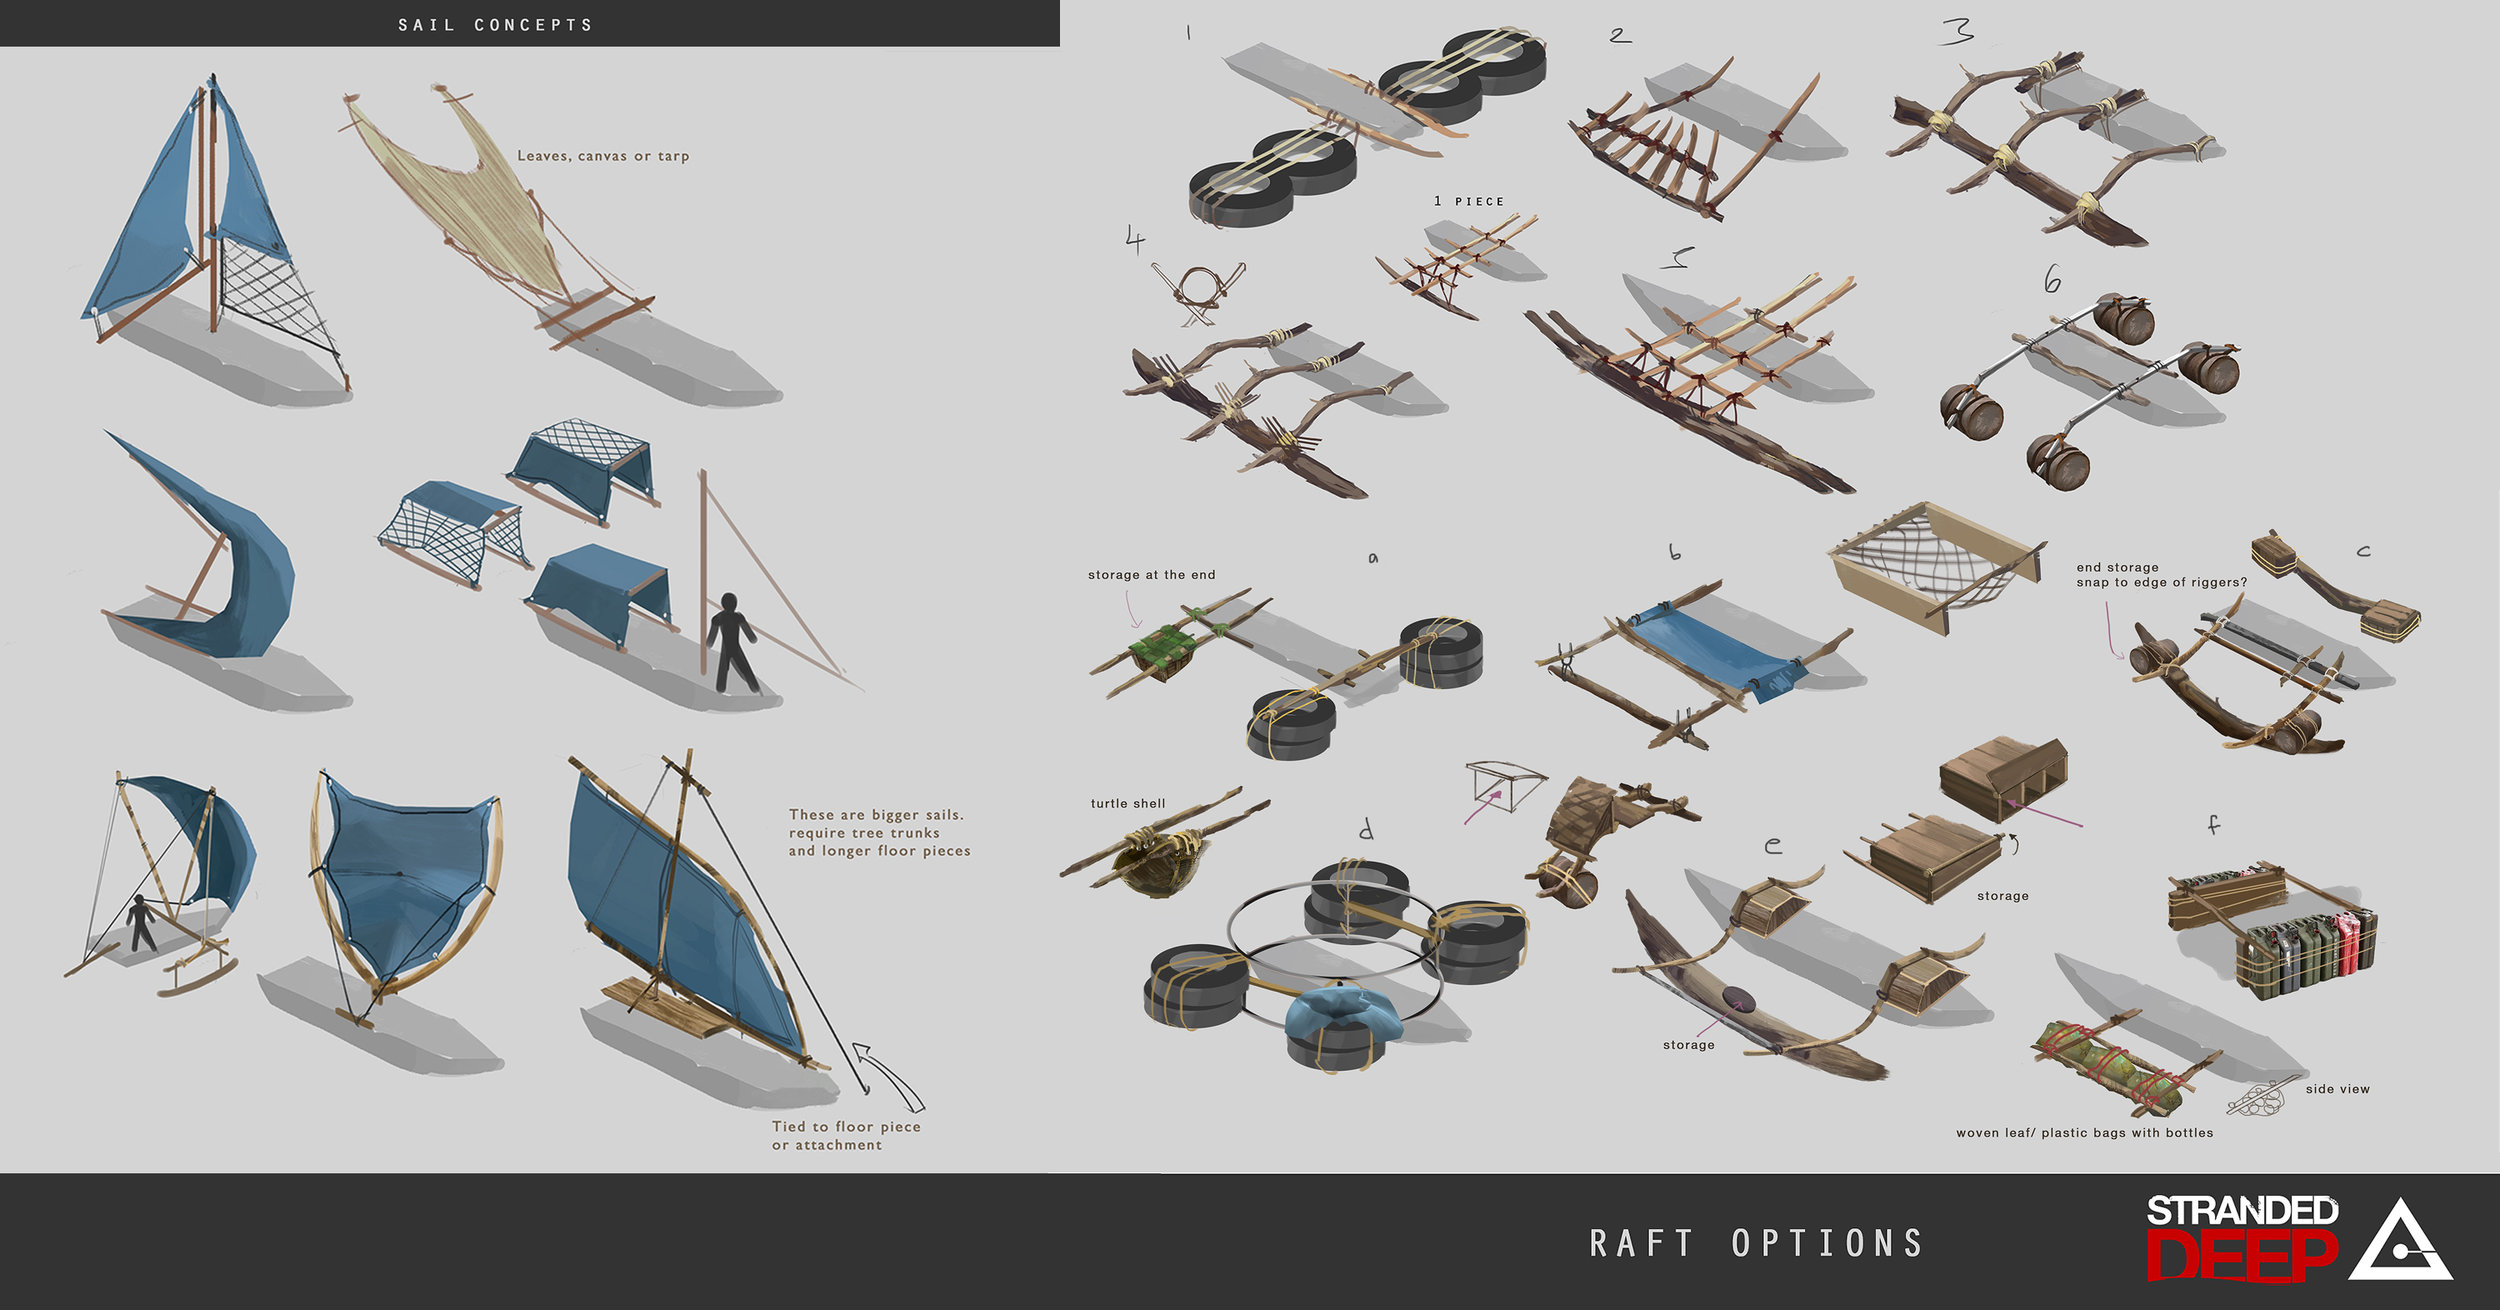 chengeling_strandeddeep_rafts_sails_concepts.jpg